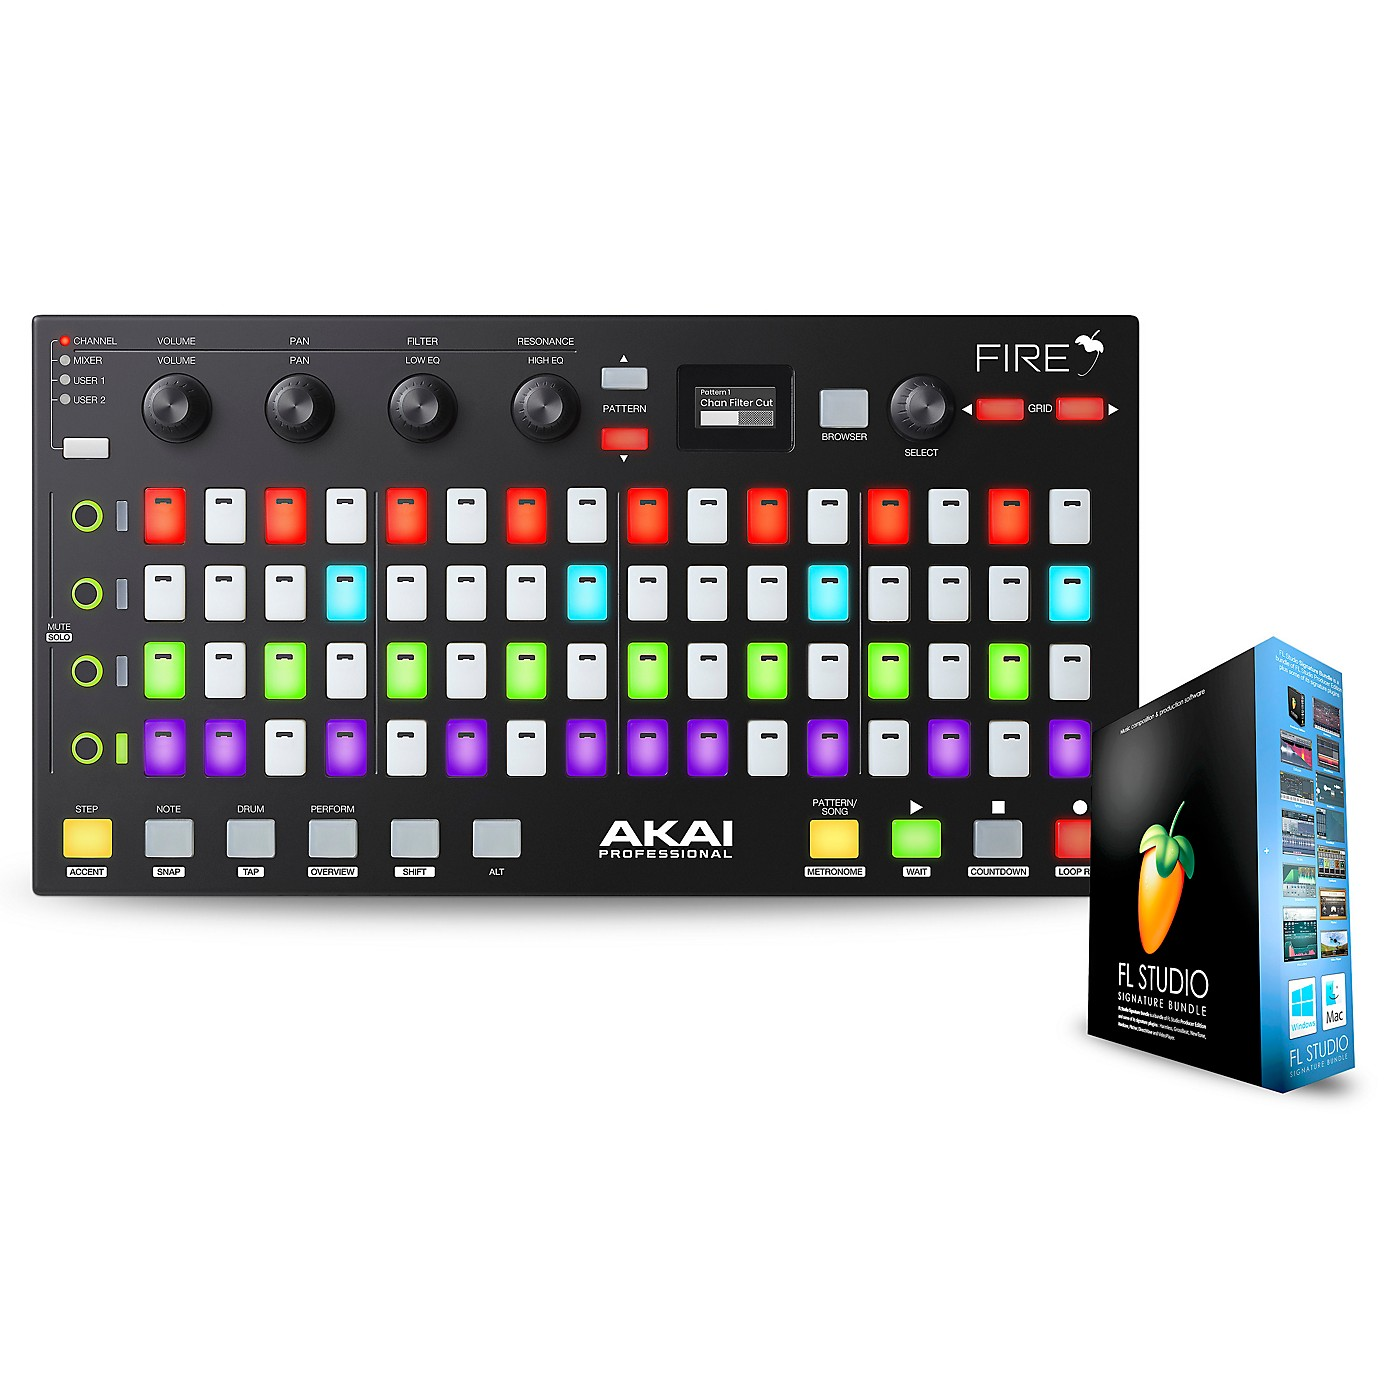 Akai Professional Fire FL Studio Controller with FL Studio Signature Bundle thumbnail